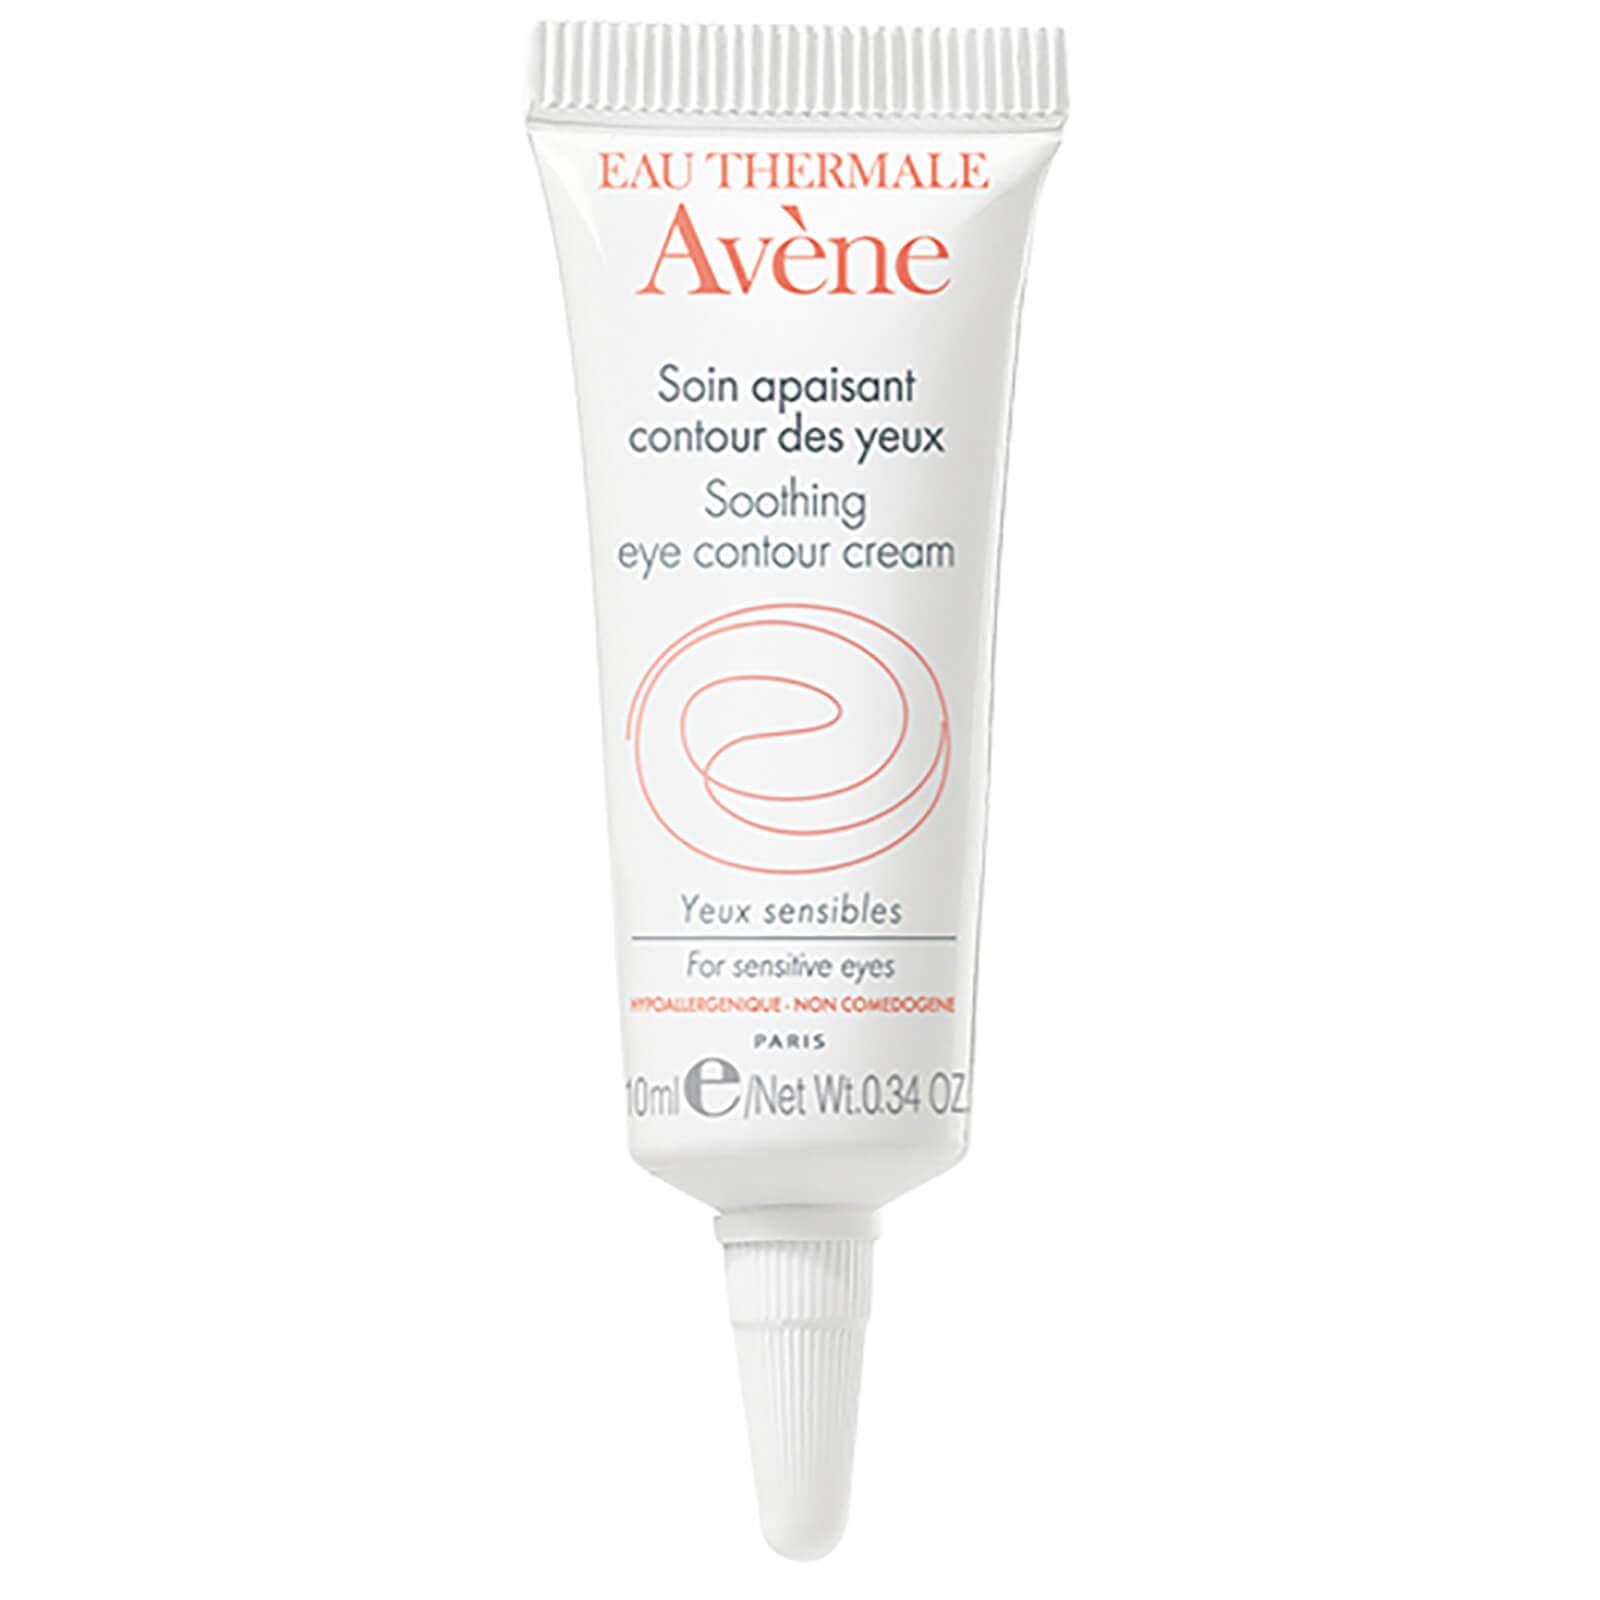 Avène Soothing Eye Contour Cream